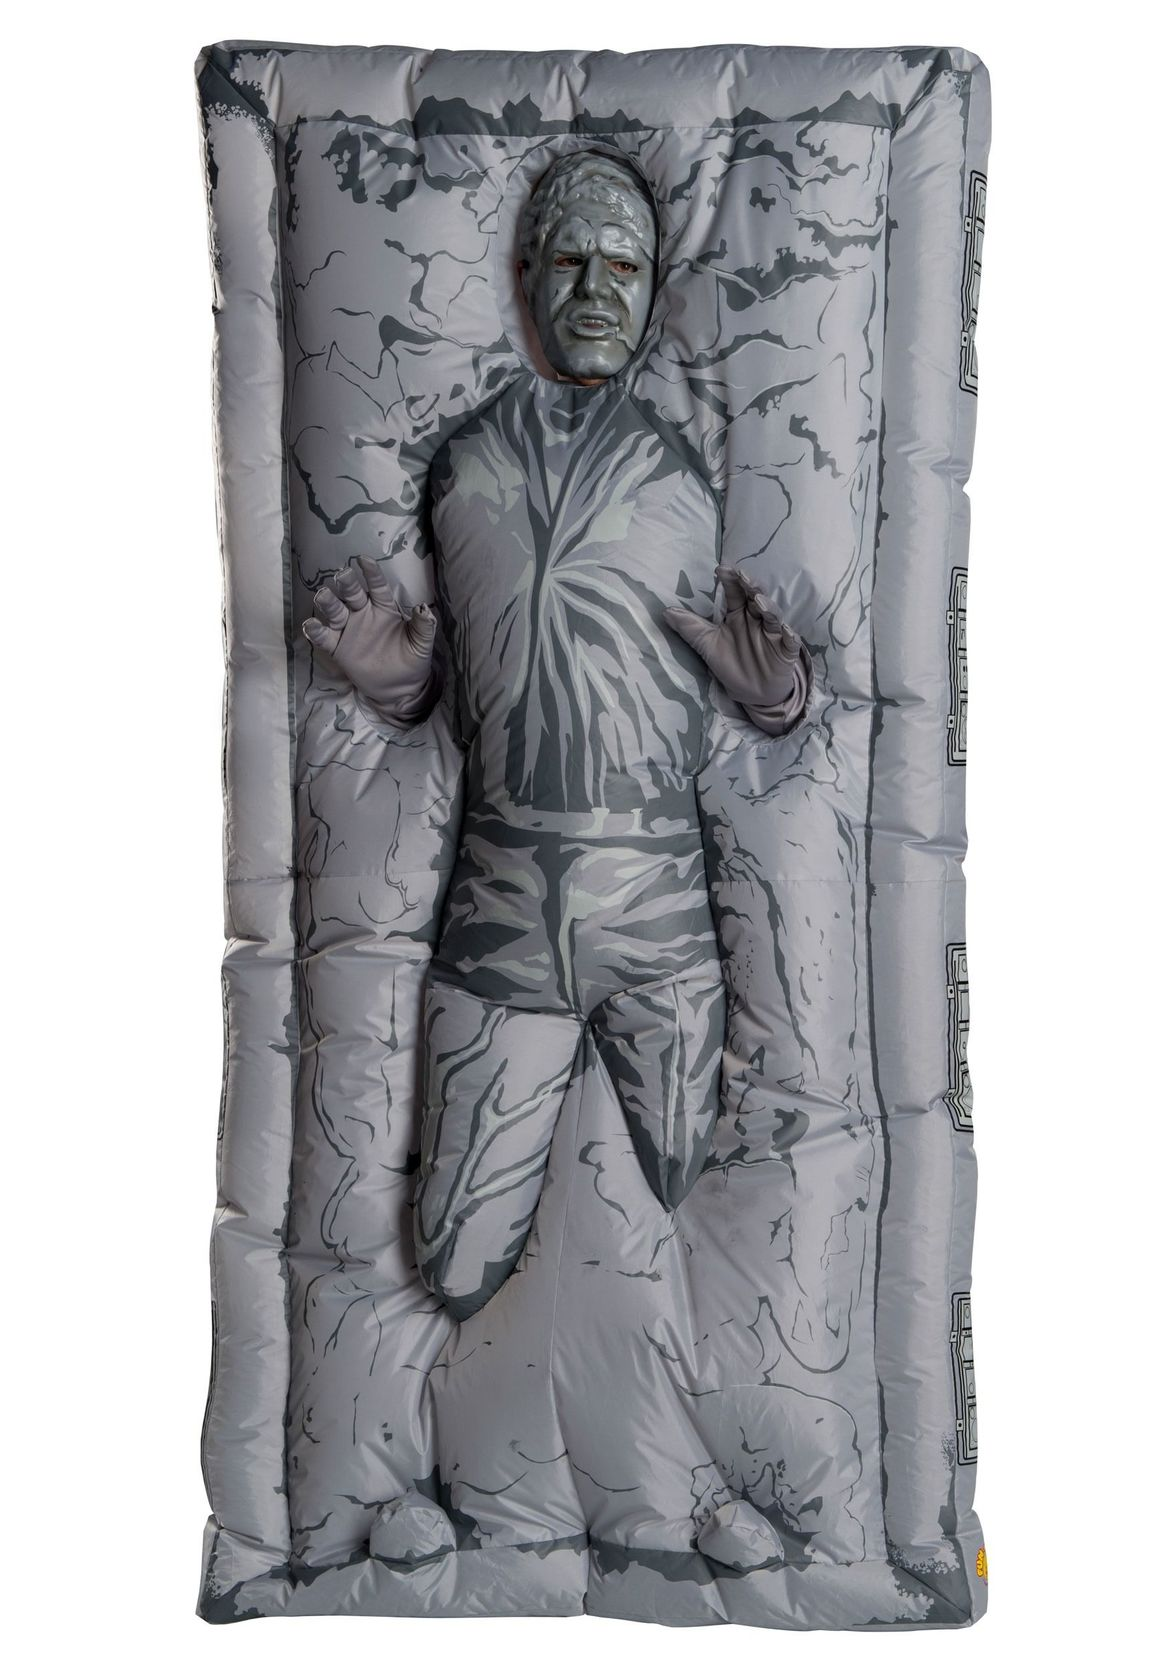 Han Solo Carbonite costume